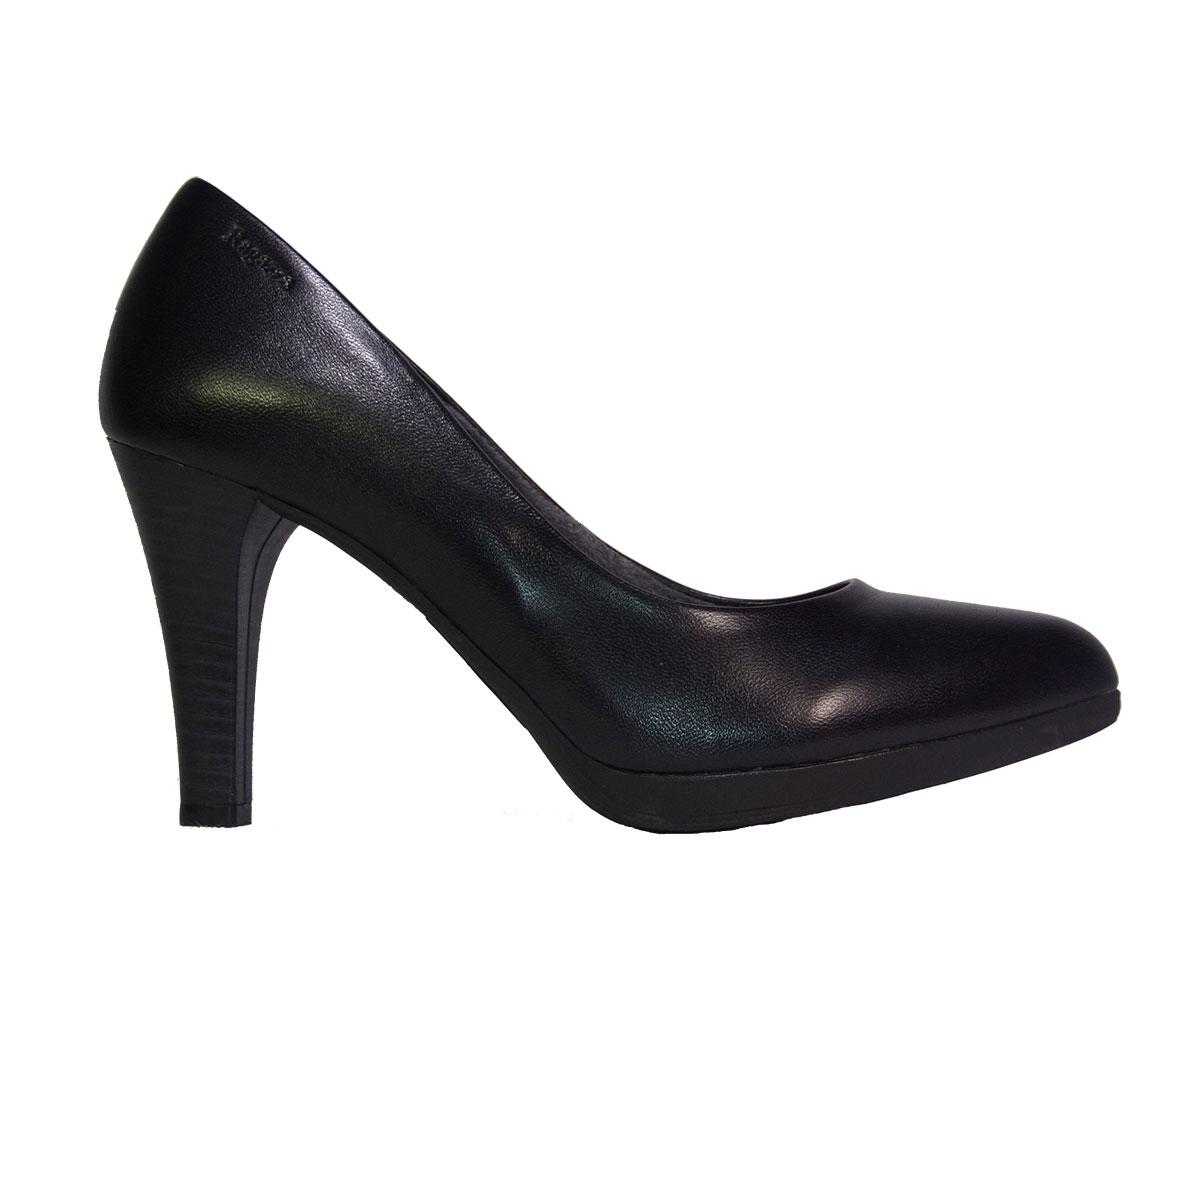 2aad7f114d Ragazza 095 Γυναικεία Παπούτσια Γόβες Δερμάτινες Μαύρο – ILoveMyShoes